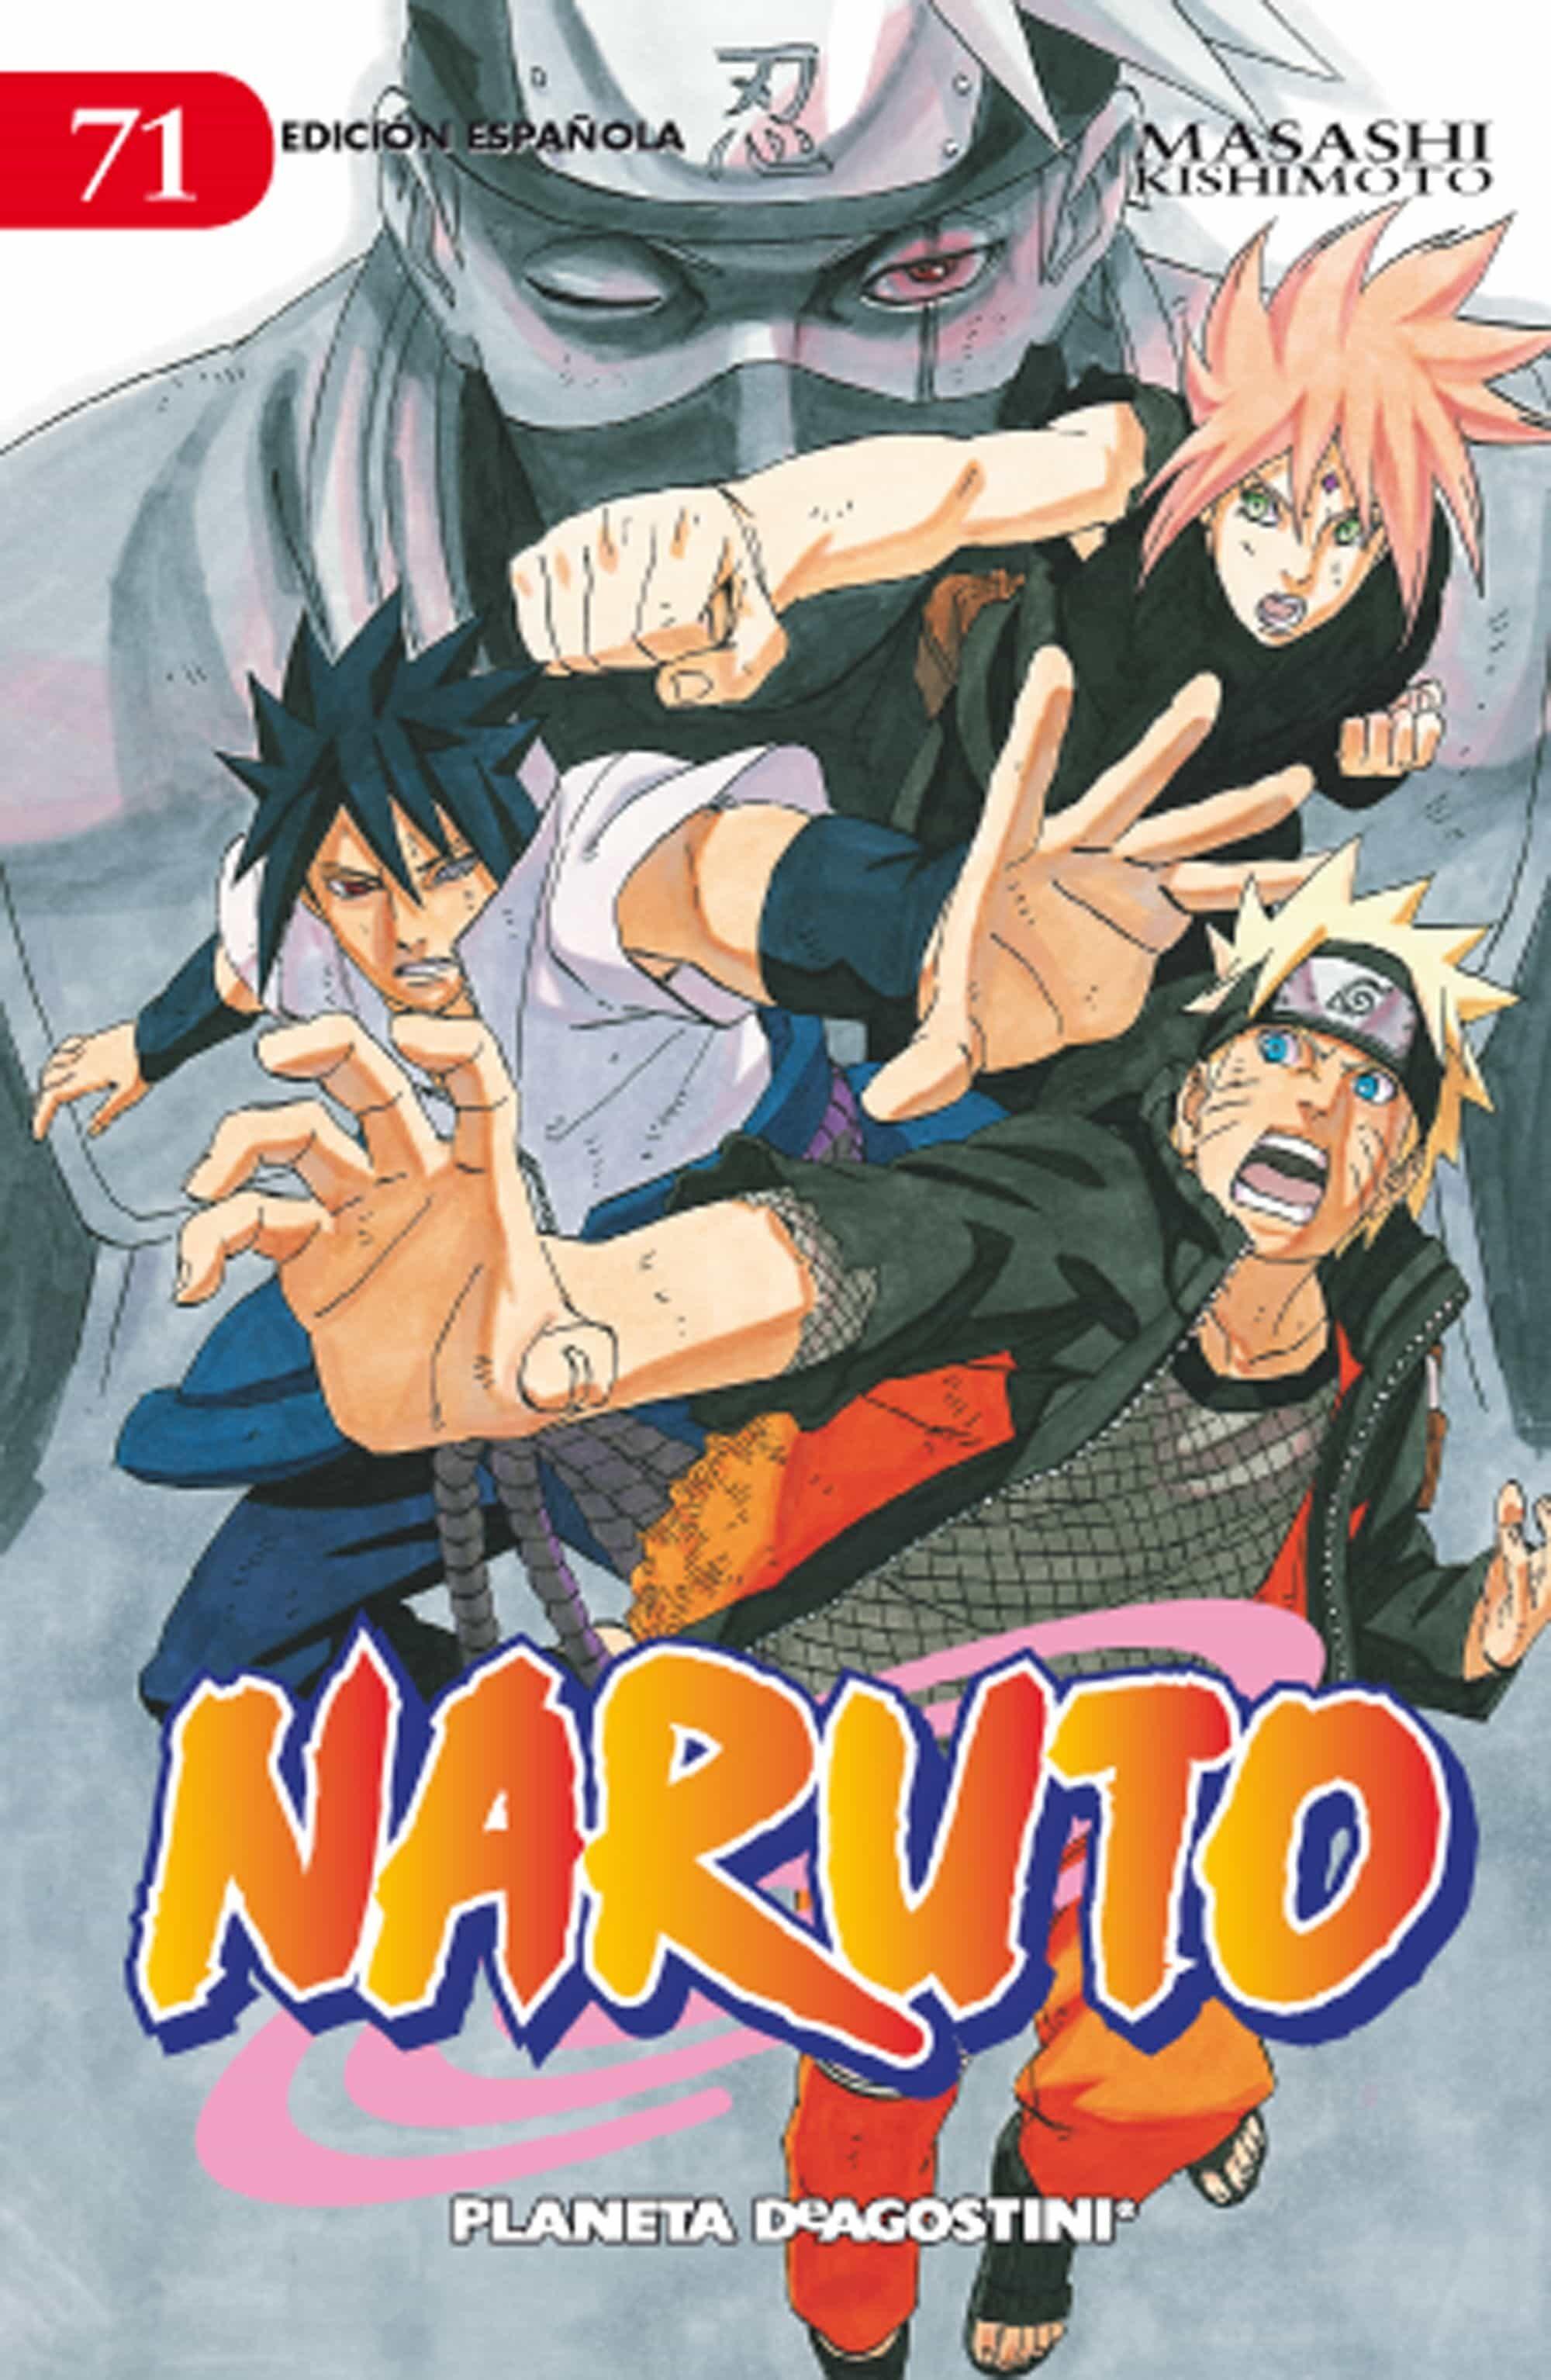 PDF Gratis Naruto Nº 71 (de 72) (pda)